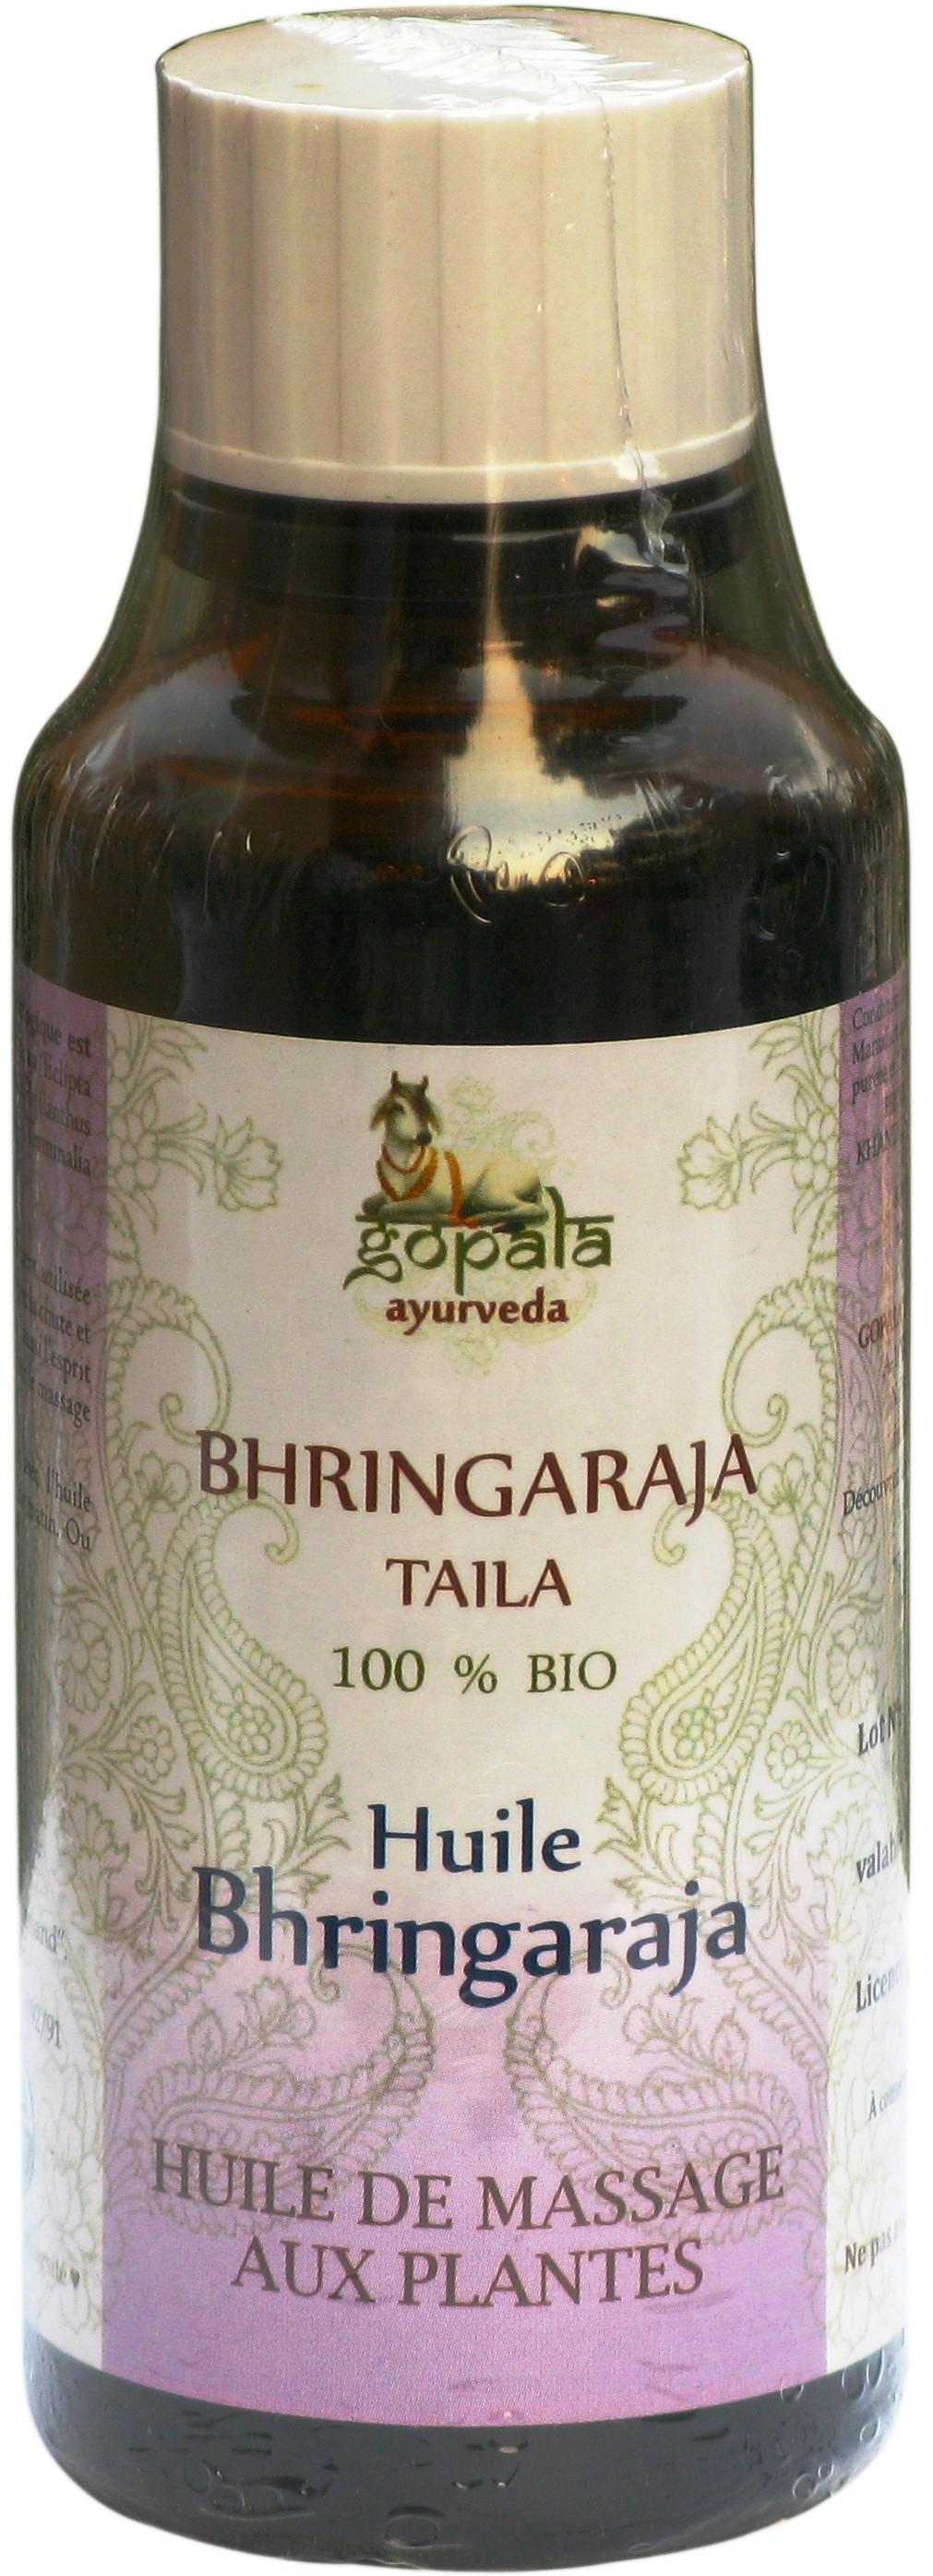 Gopala Ayurveda BHRINGARAJA taila BIO